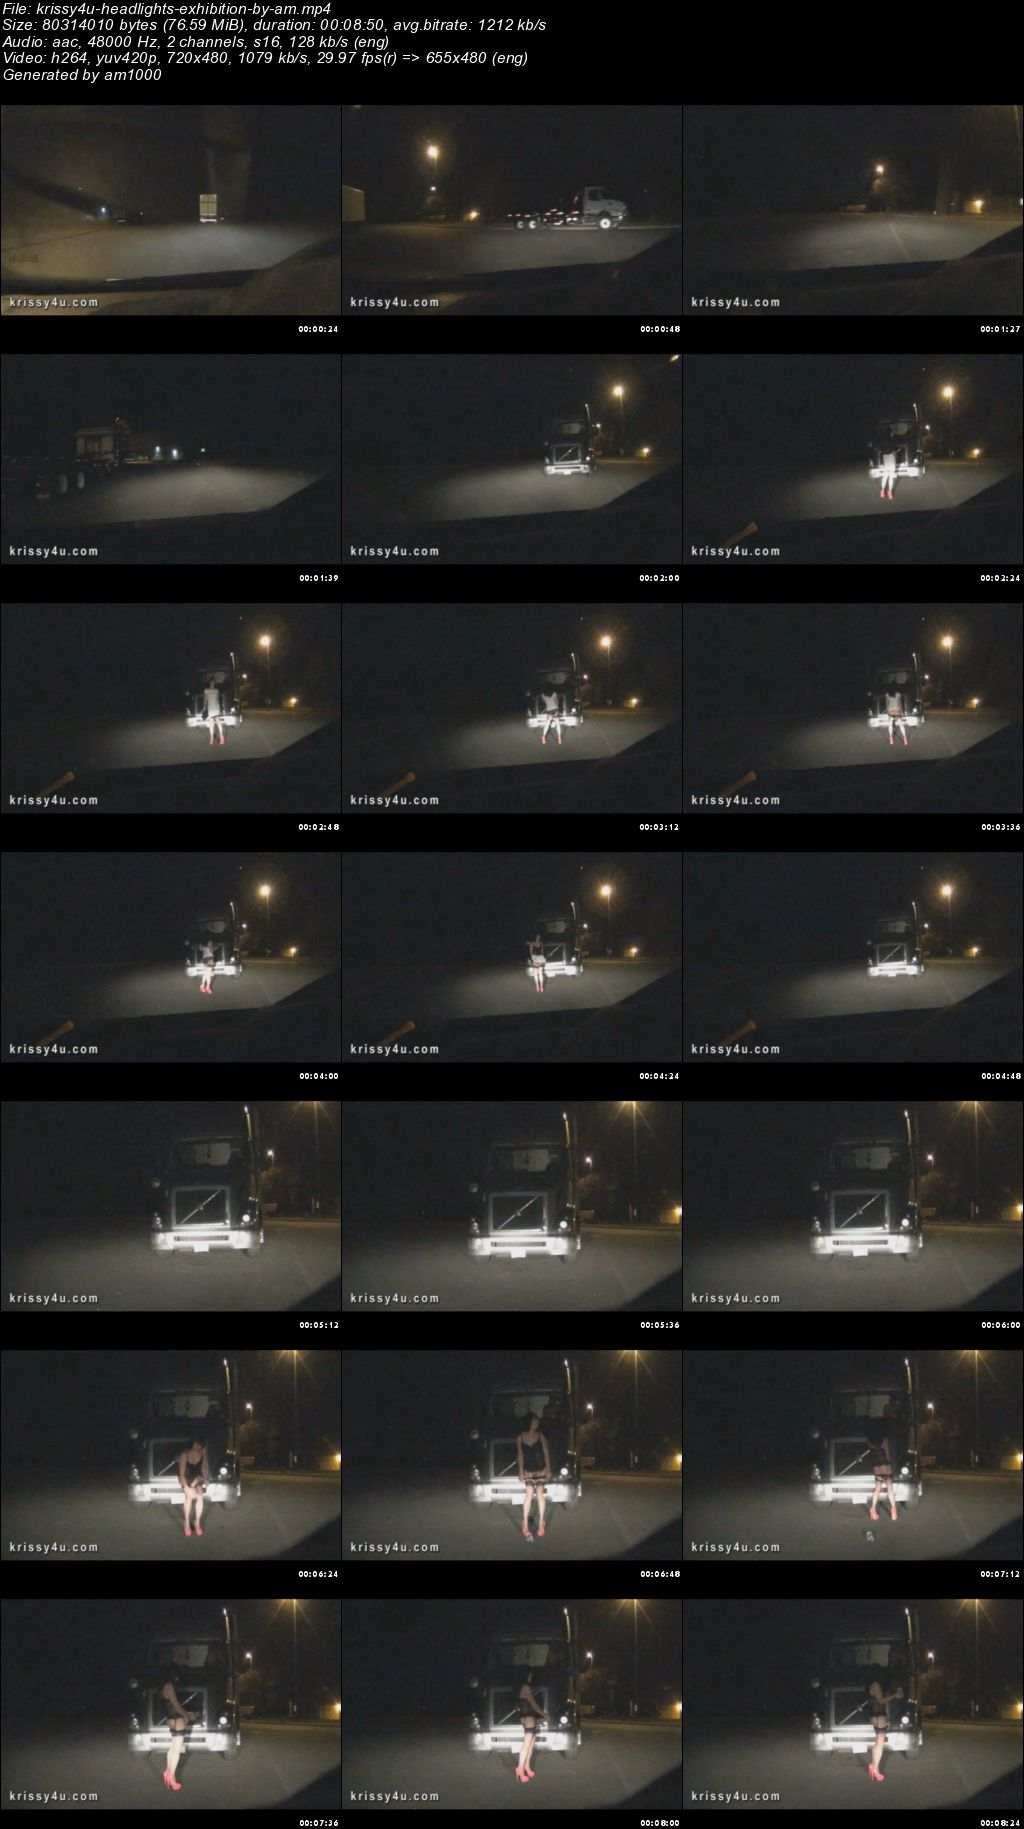 krissy4u-headlights-exhibition-by-am.jpeg